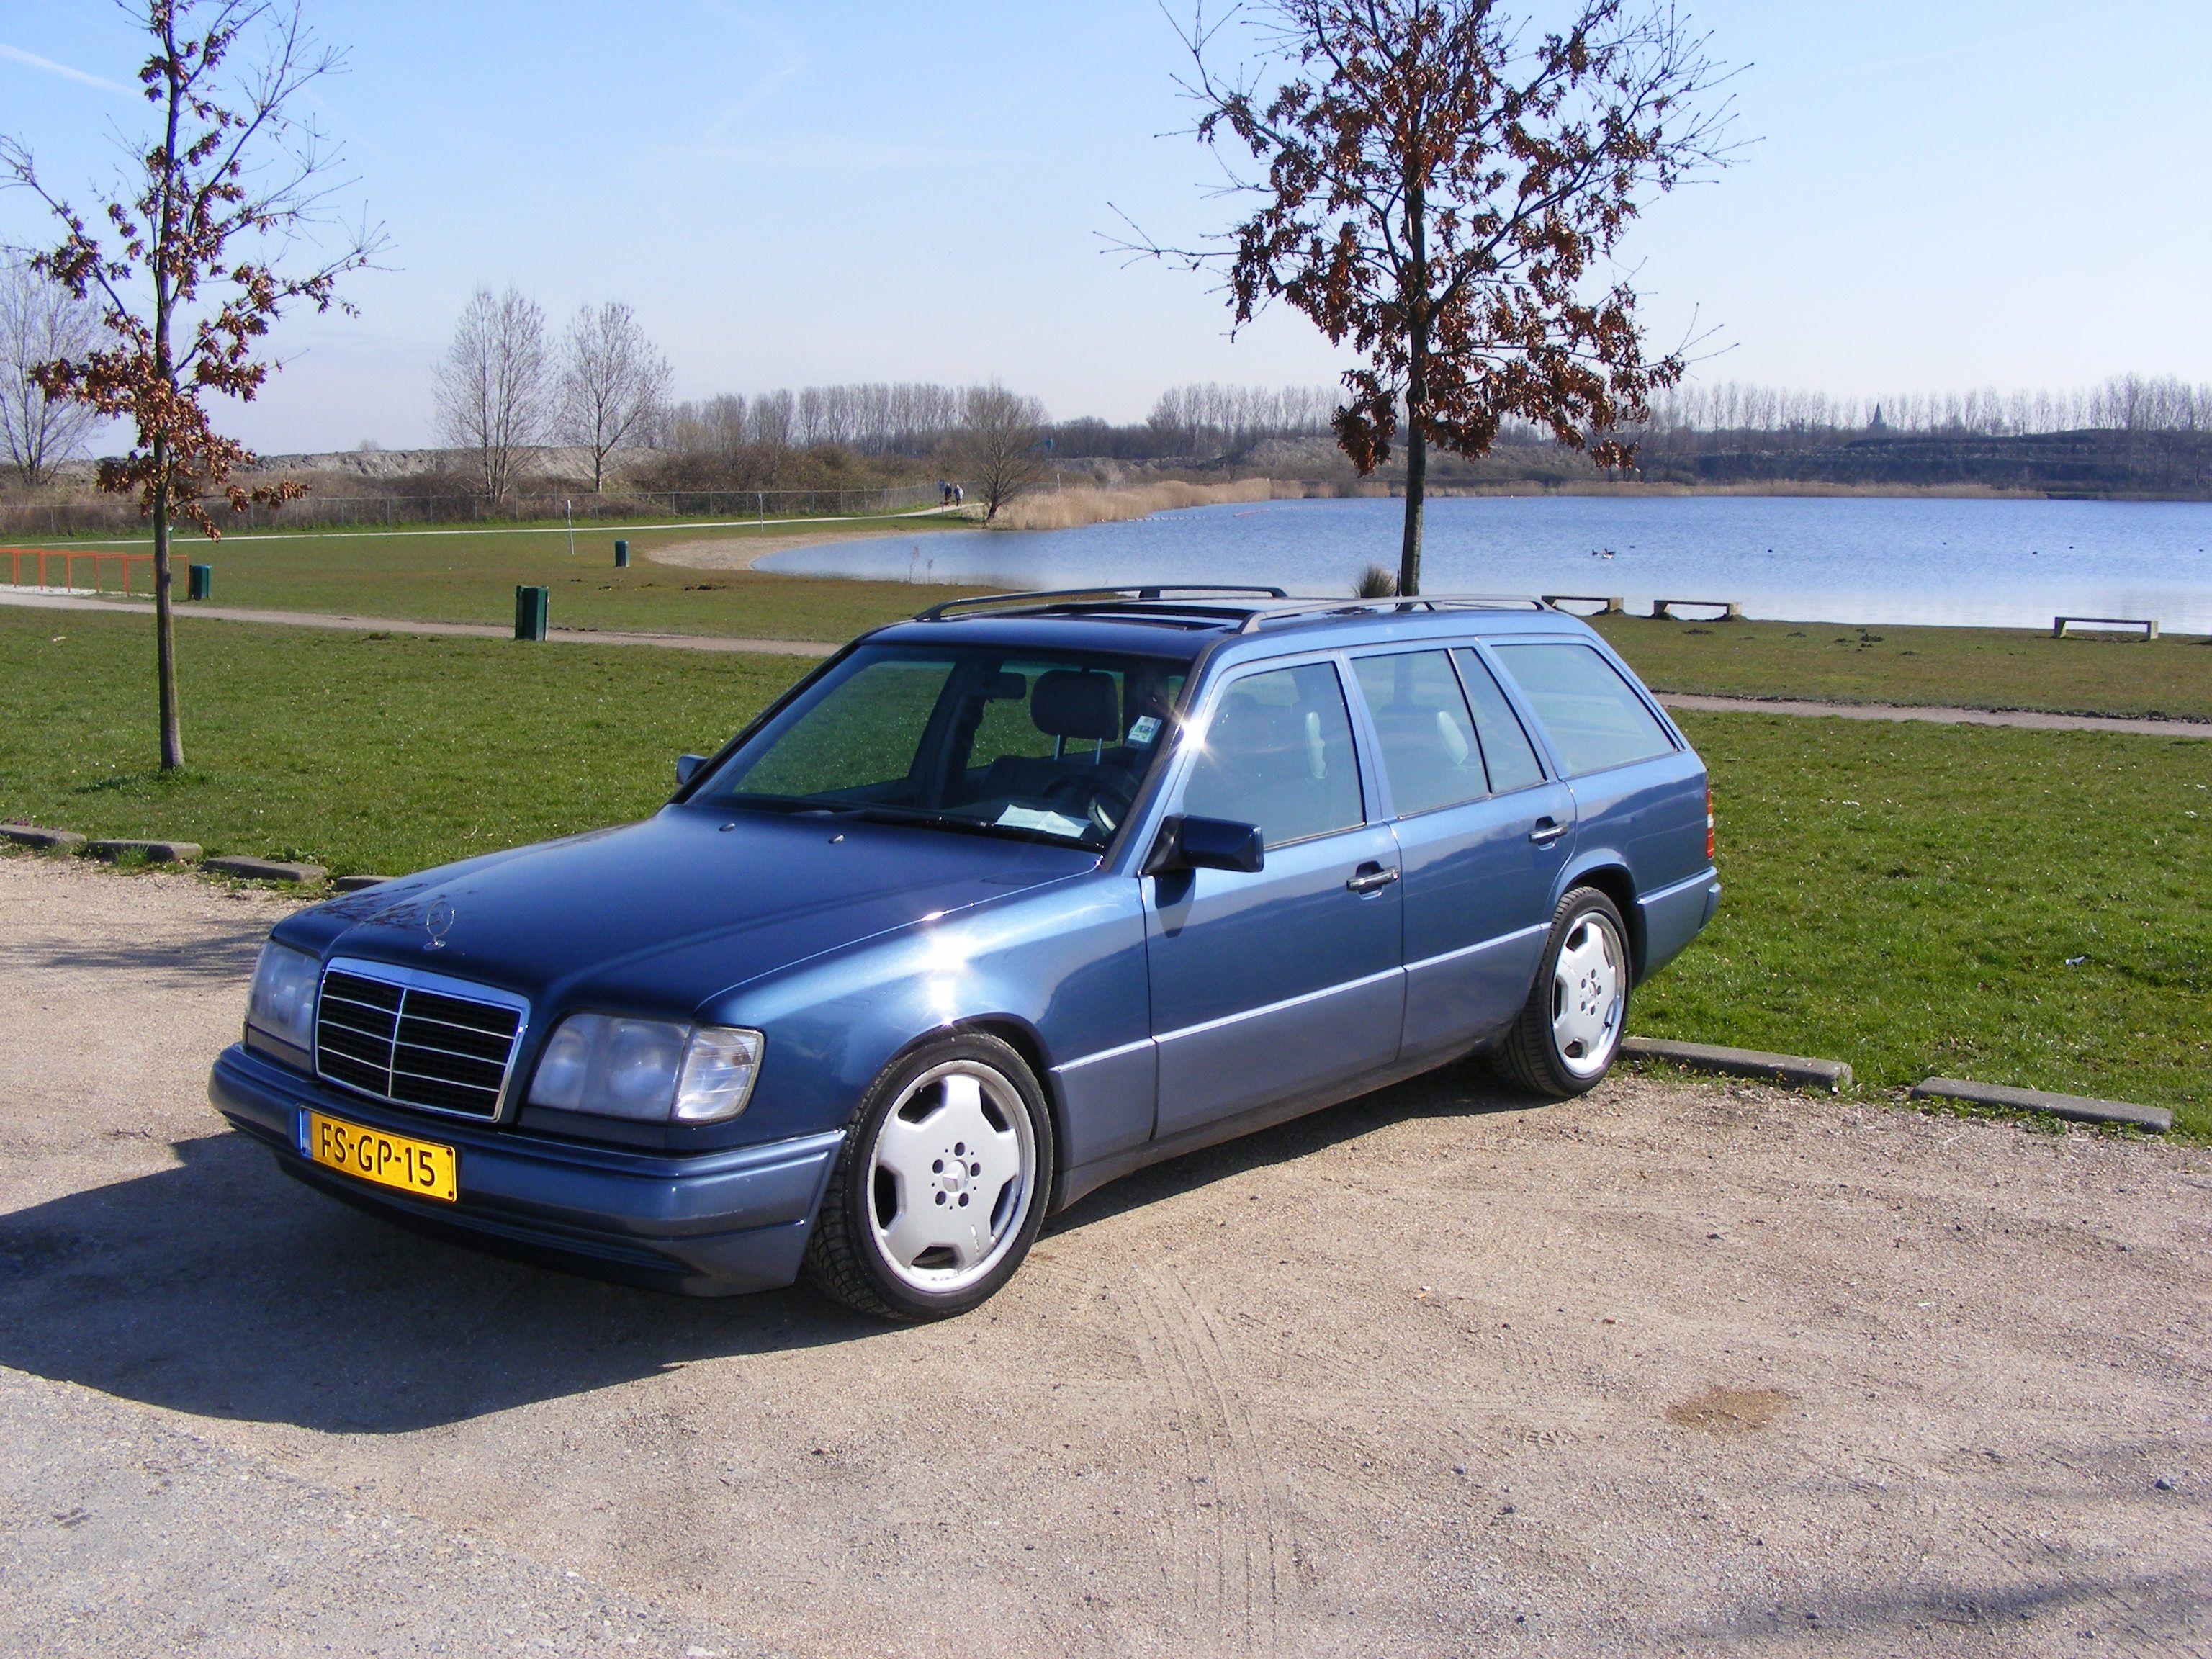 Tuning wald international mercedes benz e class estate w211 - Mercedes E280 Estate W124 Fastest Car I Owned